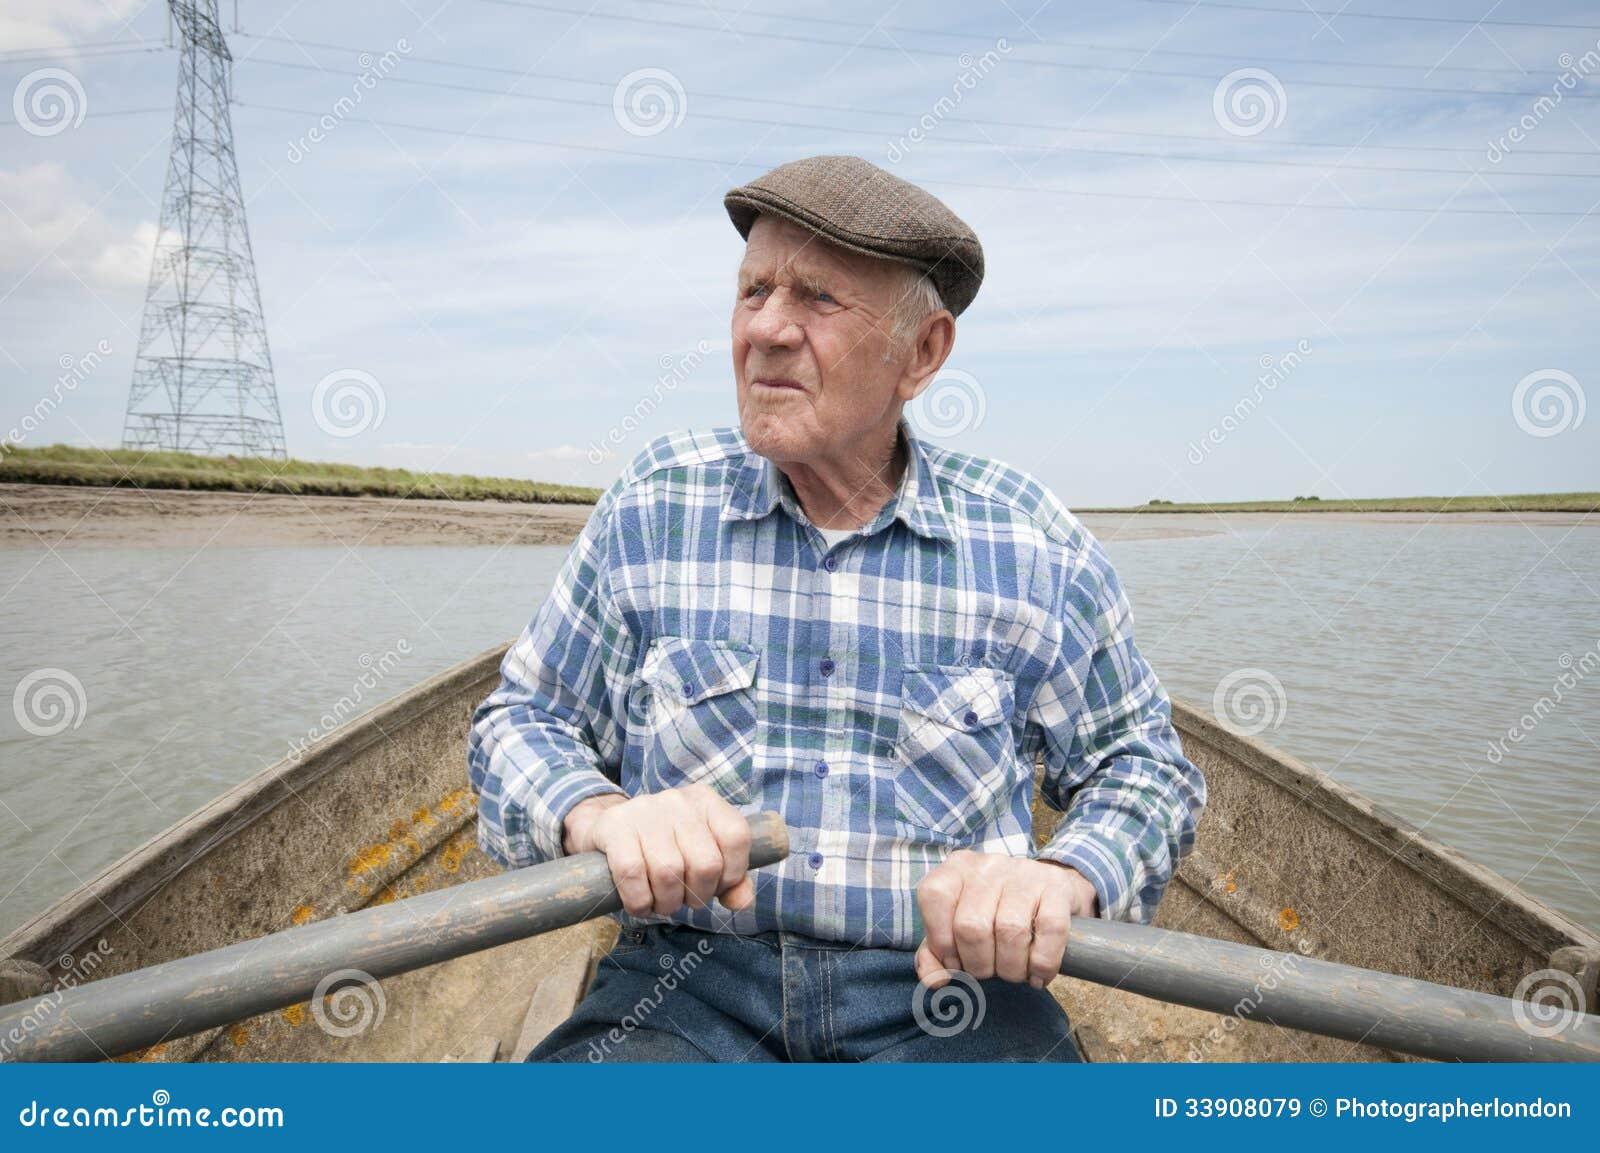 Elderly man rowing boat royalty free stock images image for Senior fishing license